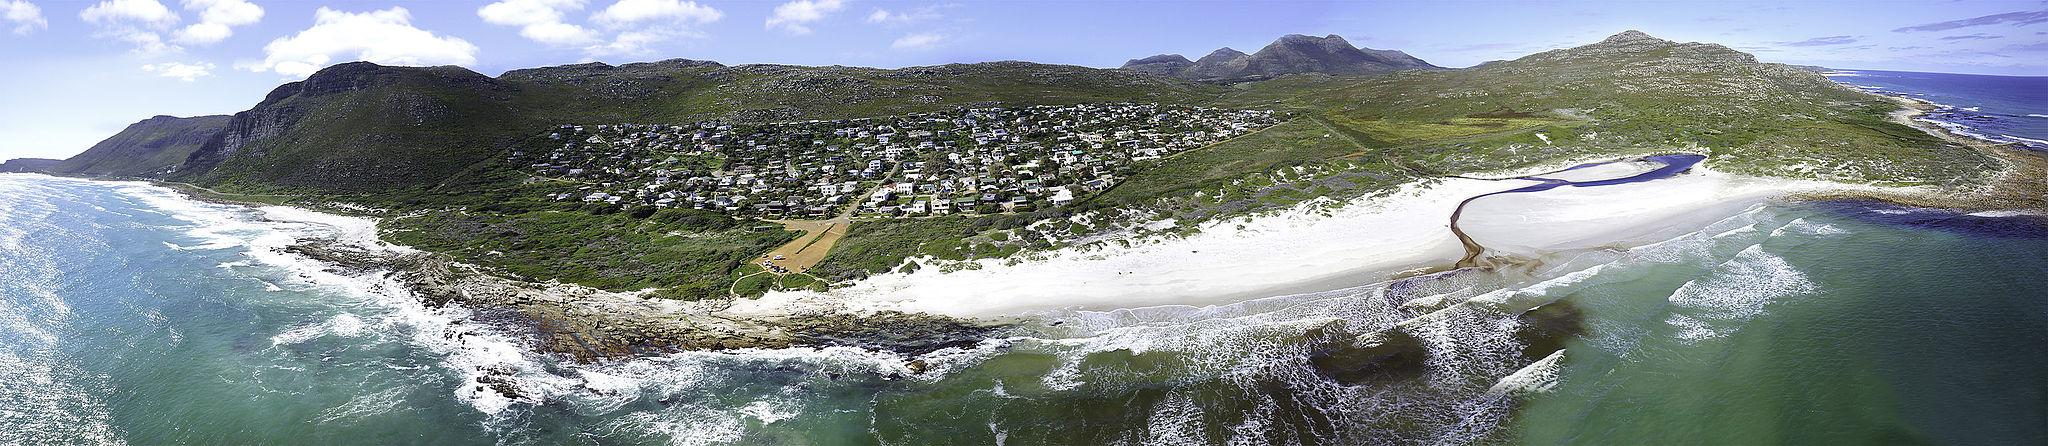 Scarborough Western Cape Coastline and City View